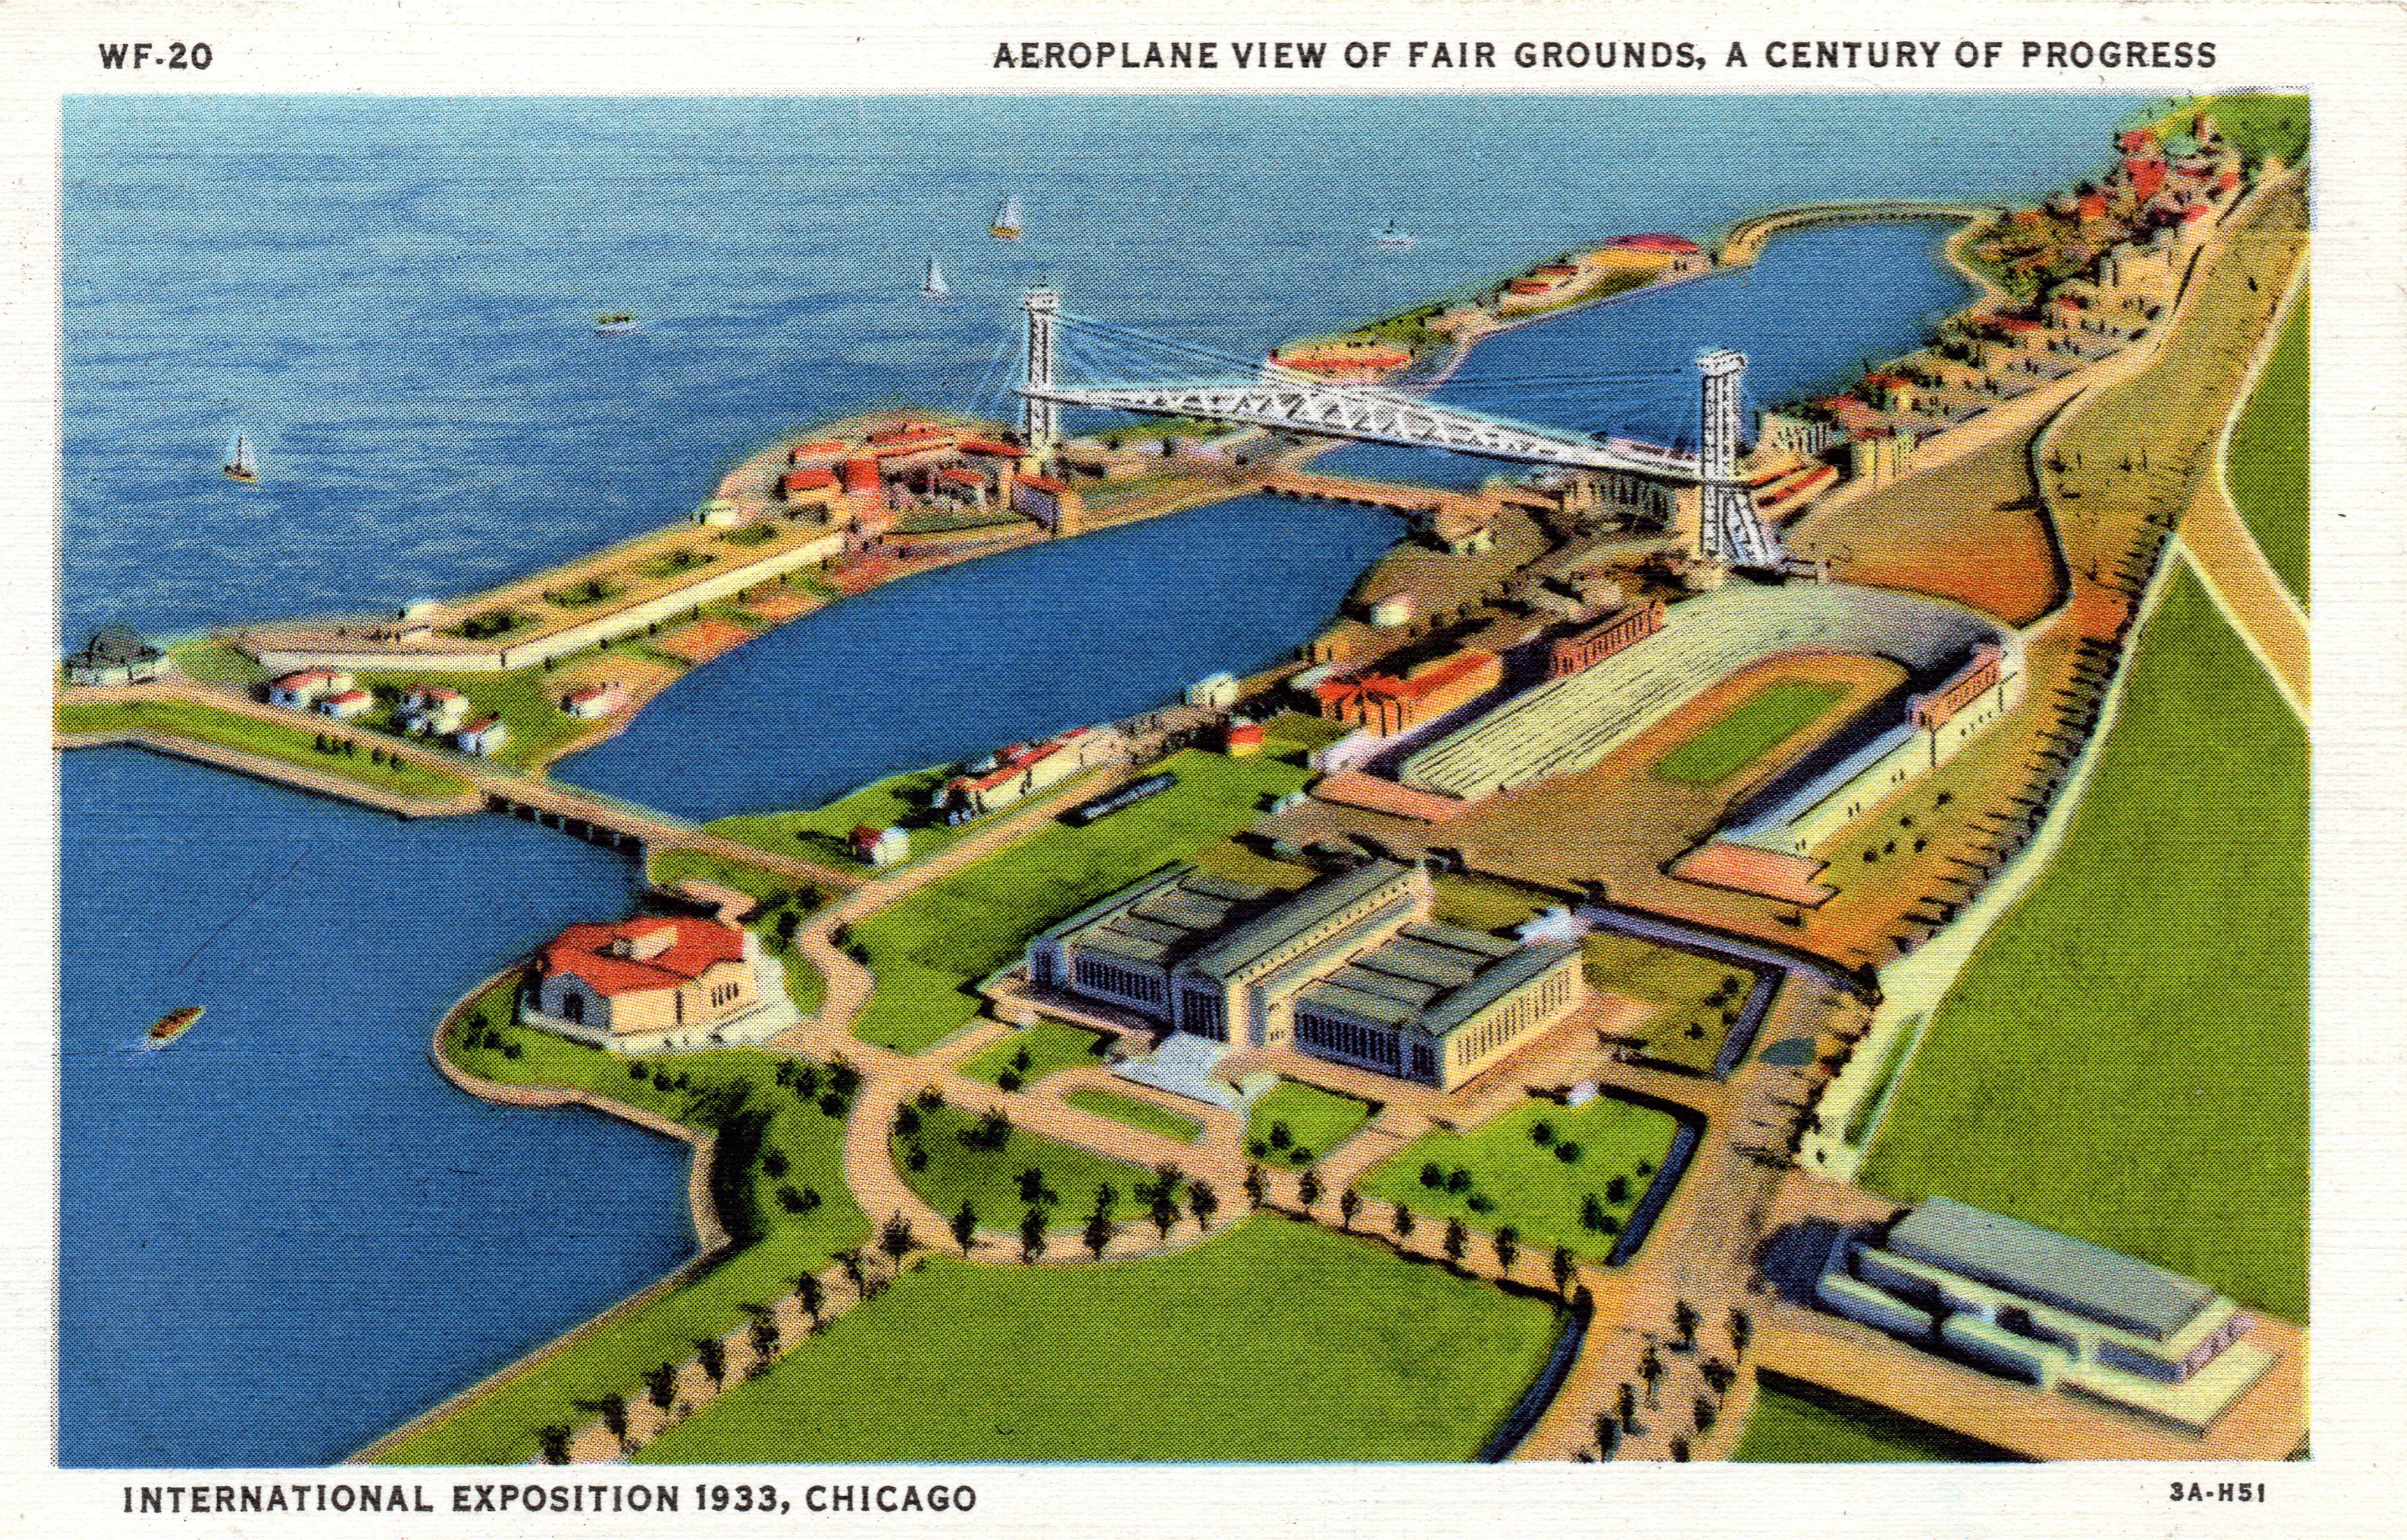 1933 CHICAGO WORLD'S FAIR AEROPLANE VIEW OF FAIR GROUNDS